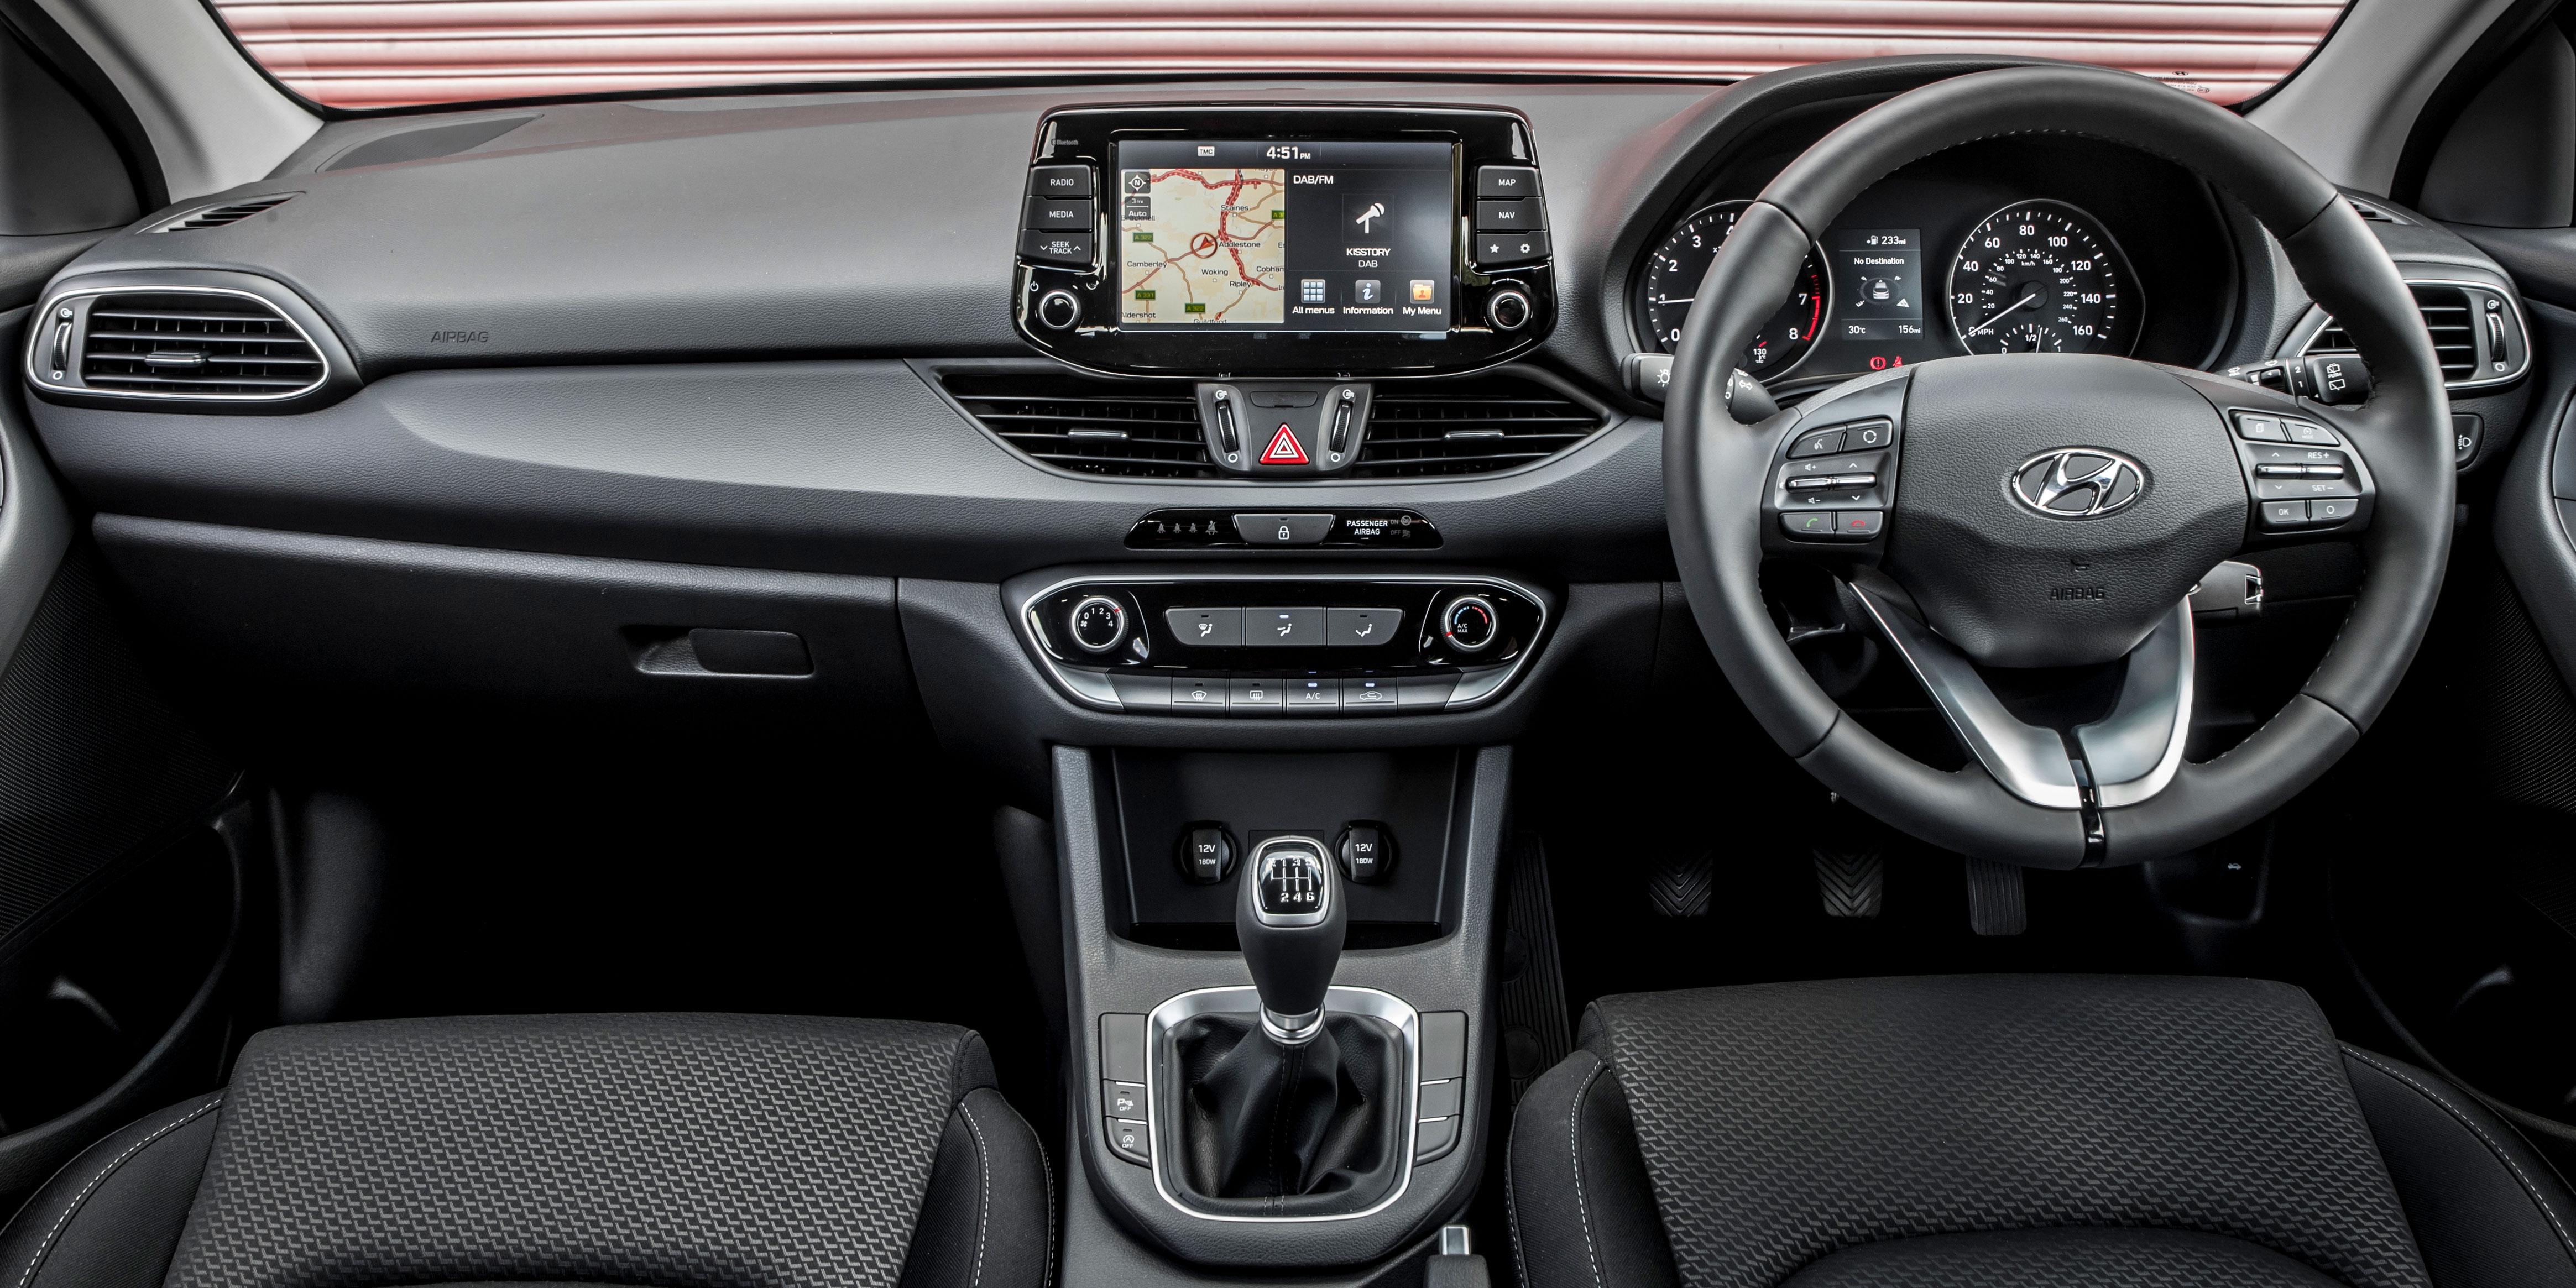 Hyundai i30 Interior & Infotainment | carwow